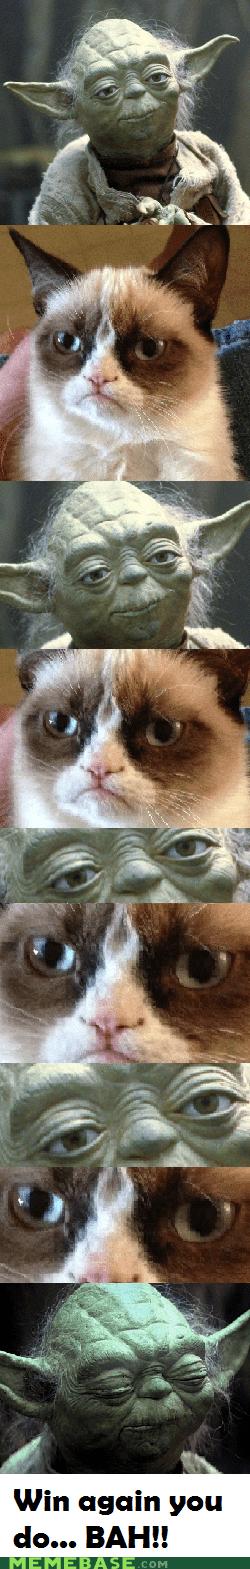 staring constest yoda Grumpy Cat tard - 6791590912